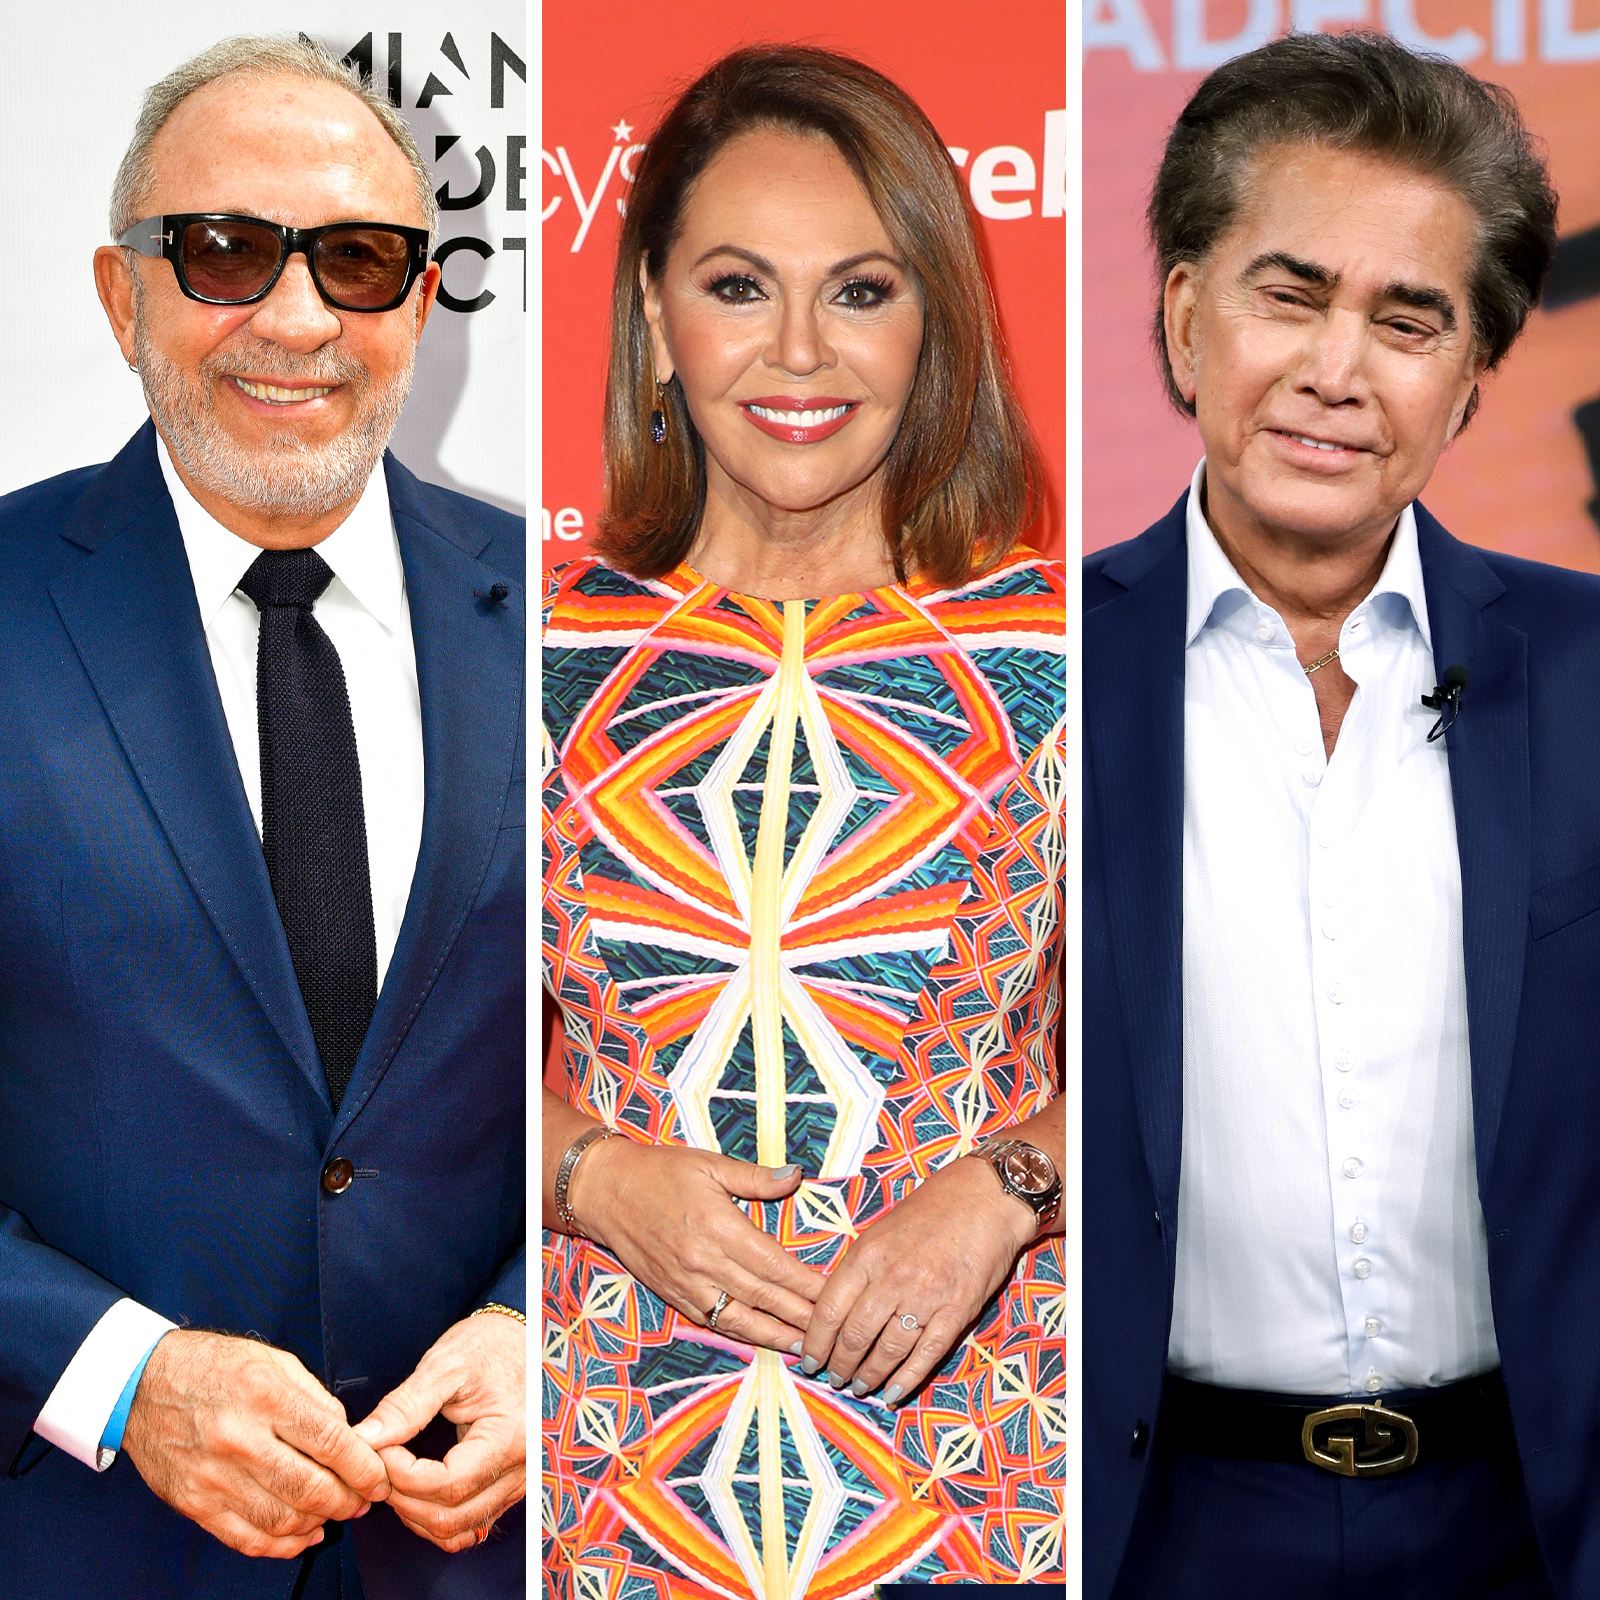 Emilio Stefan, Maria Elena Salinas, Jose Luis Rodriguez -el puma-